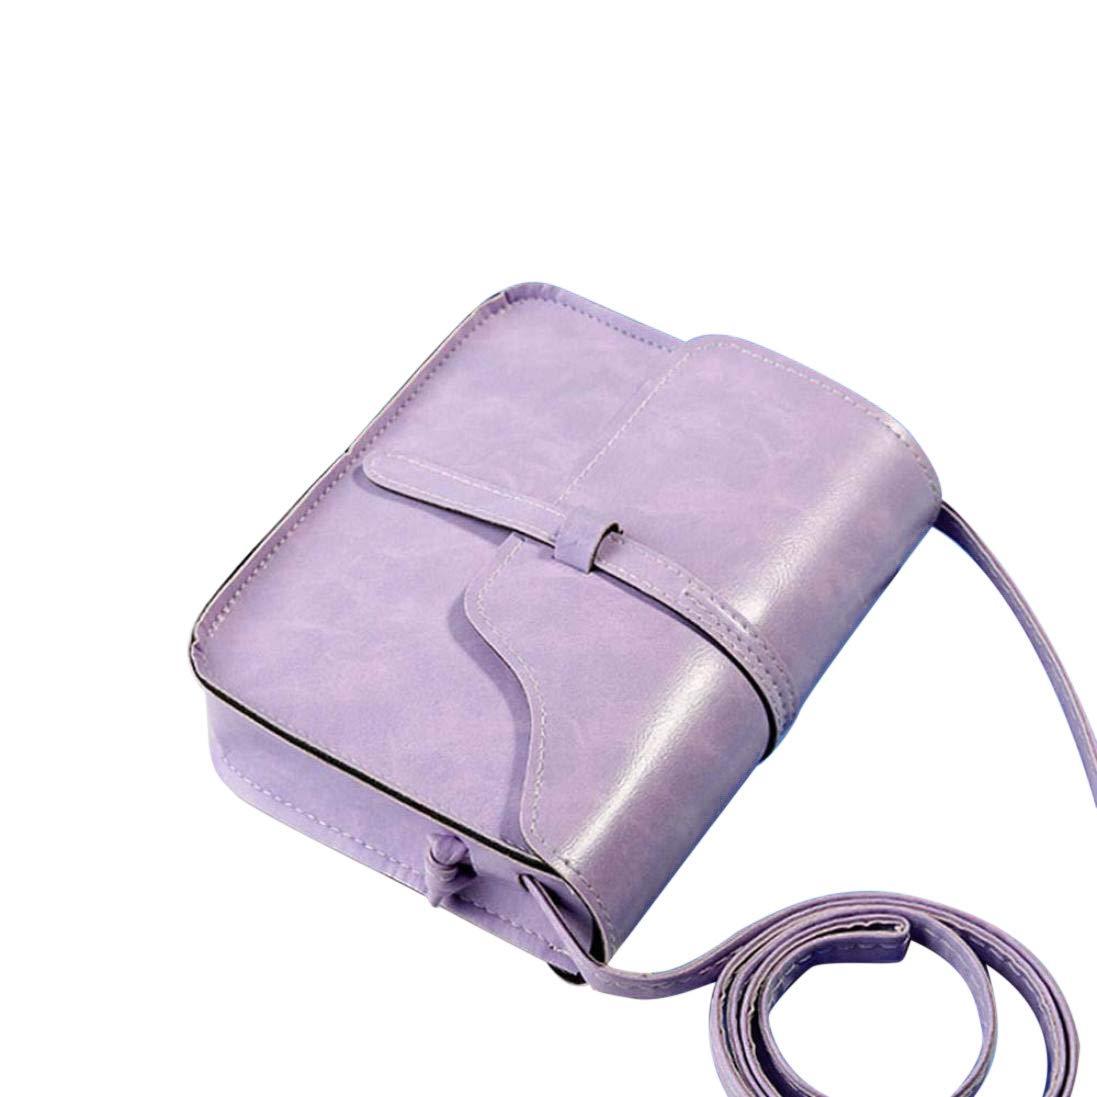 Women's Vintage Style Soft Leather Work Tote Large Shoulder Bag,SUNSEE GRIL